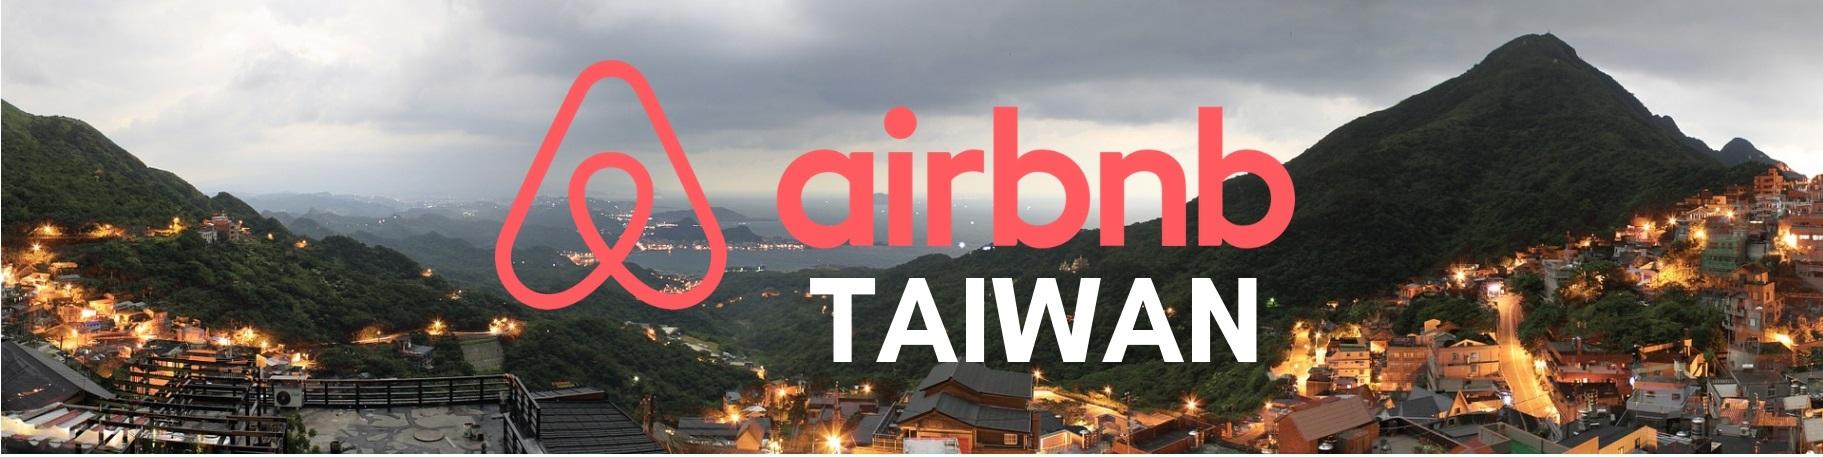 Taiwan AirBNB